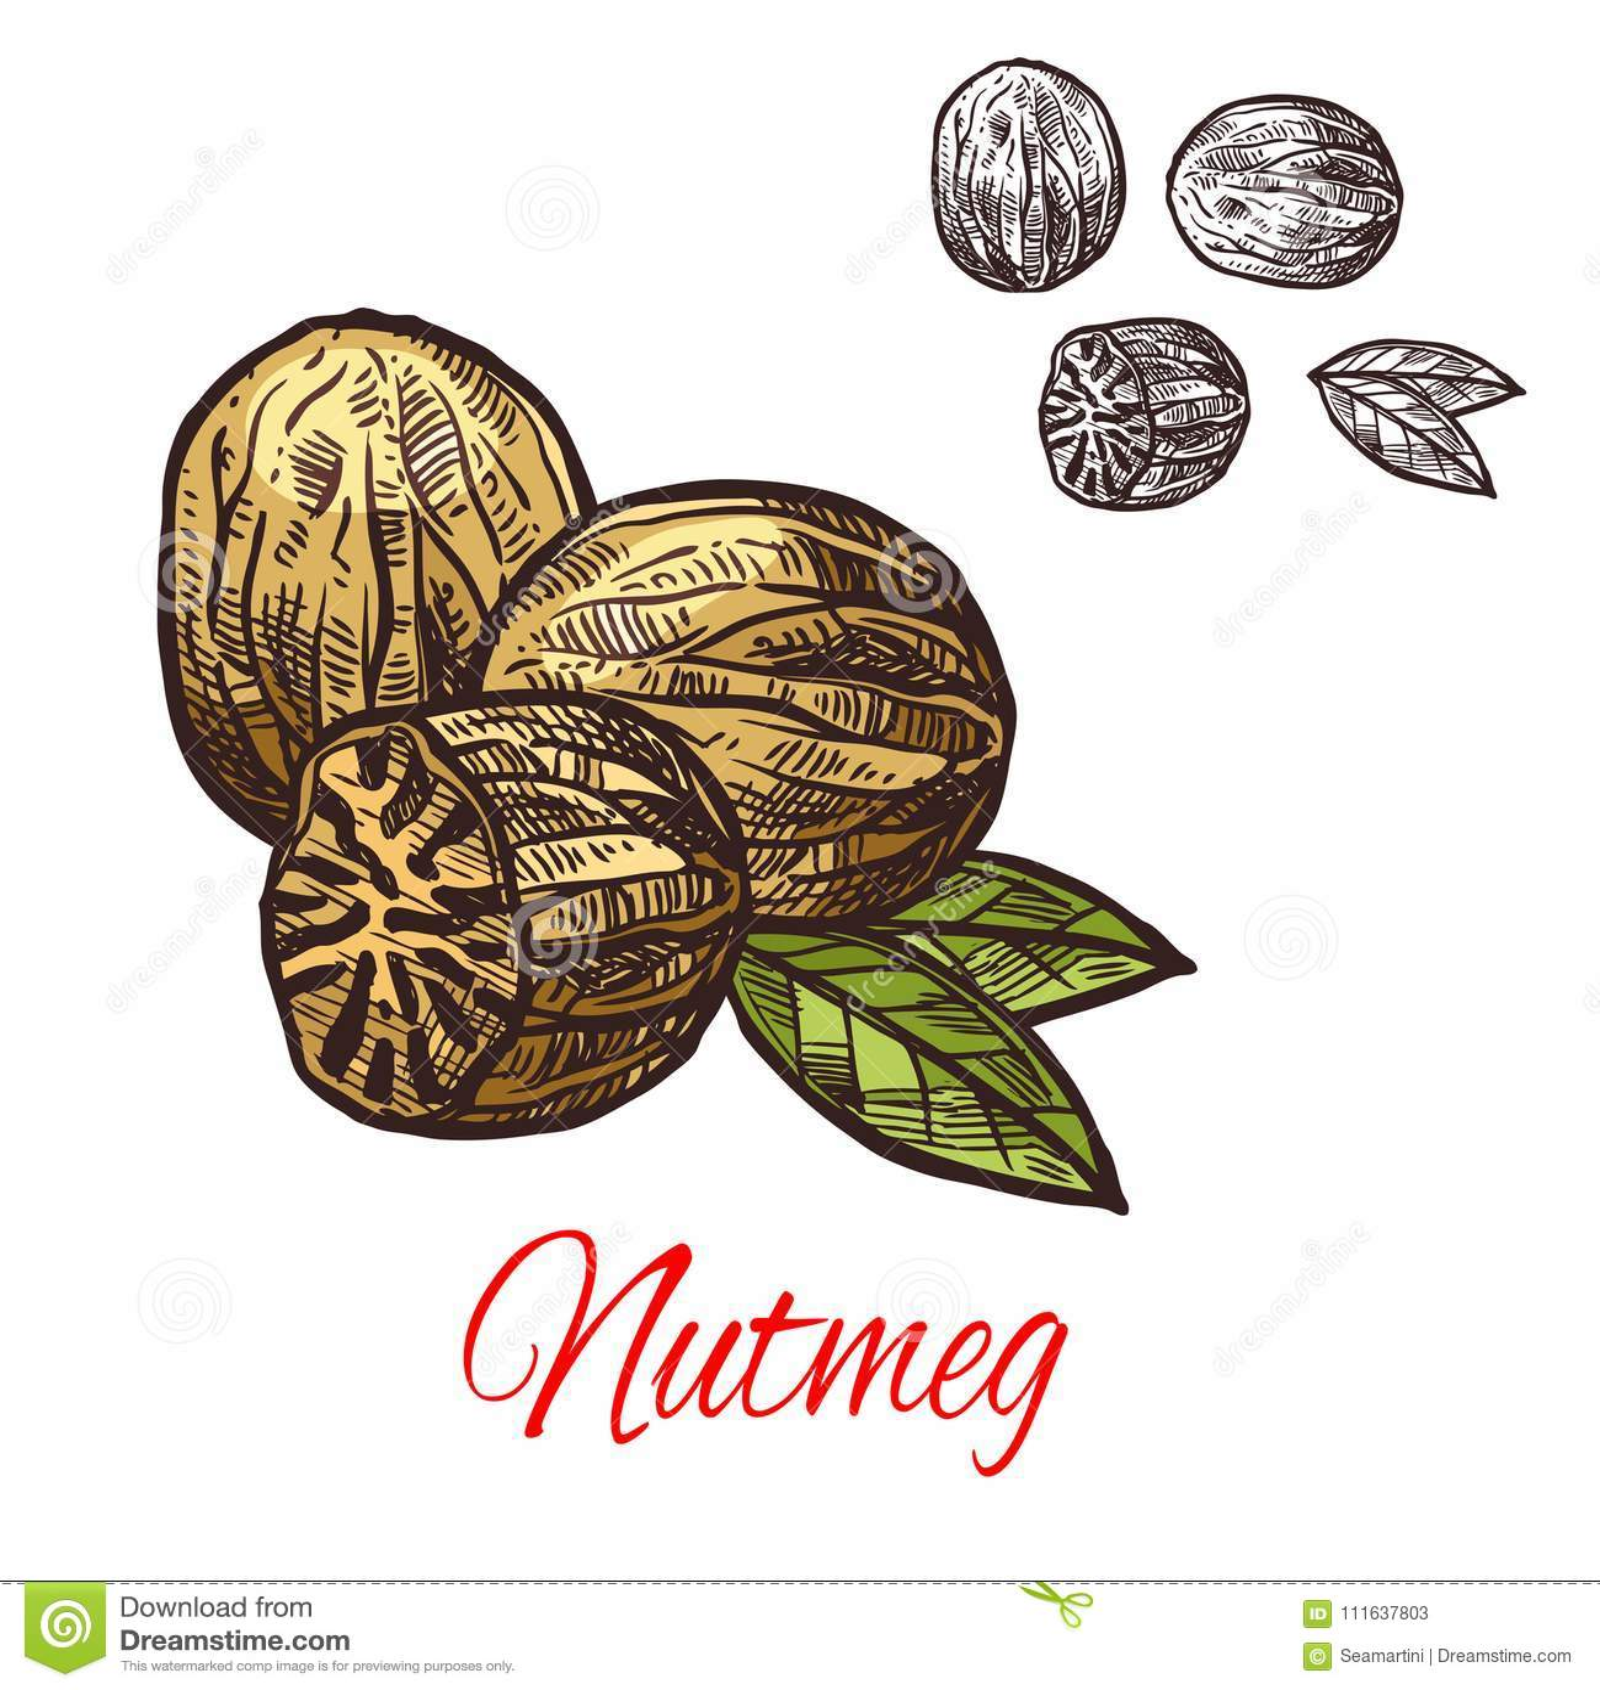 Nutmeg seasoning nut spice vector sketch icon